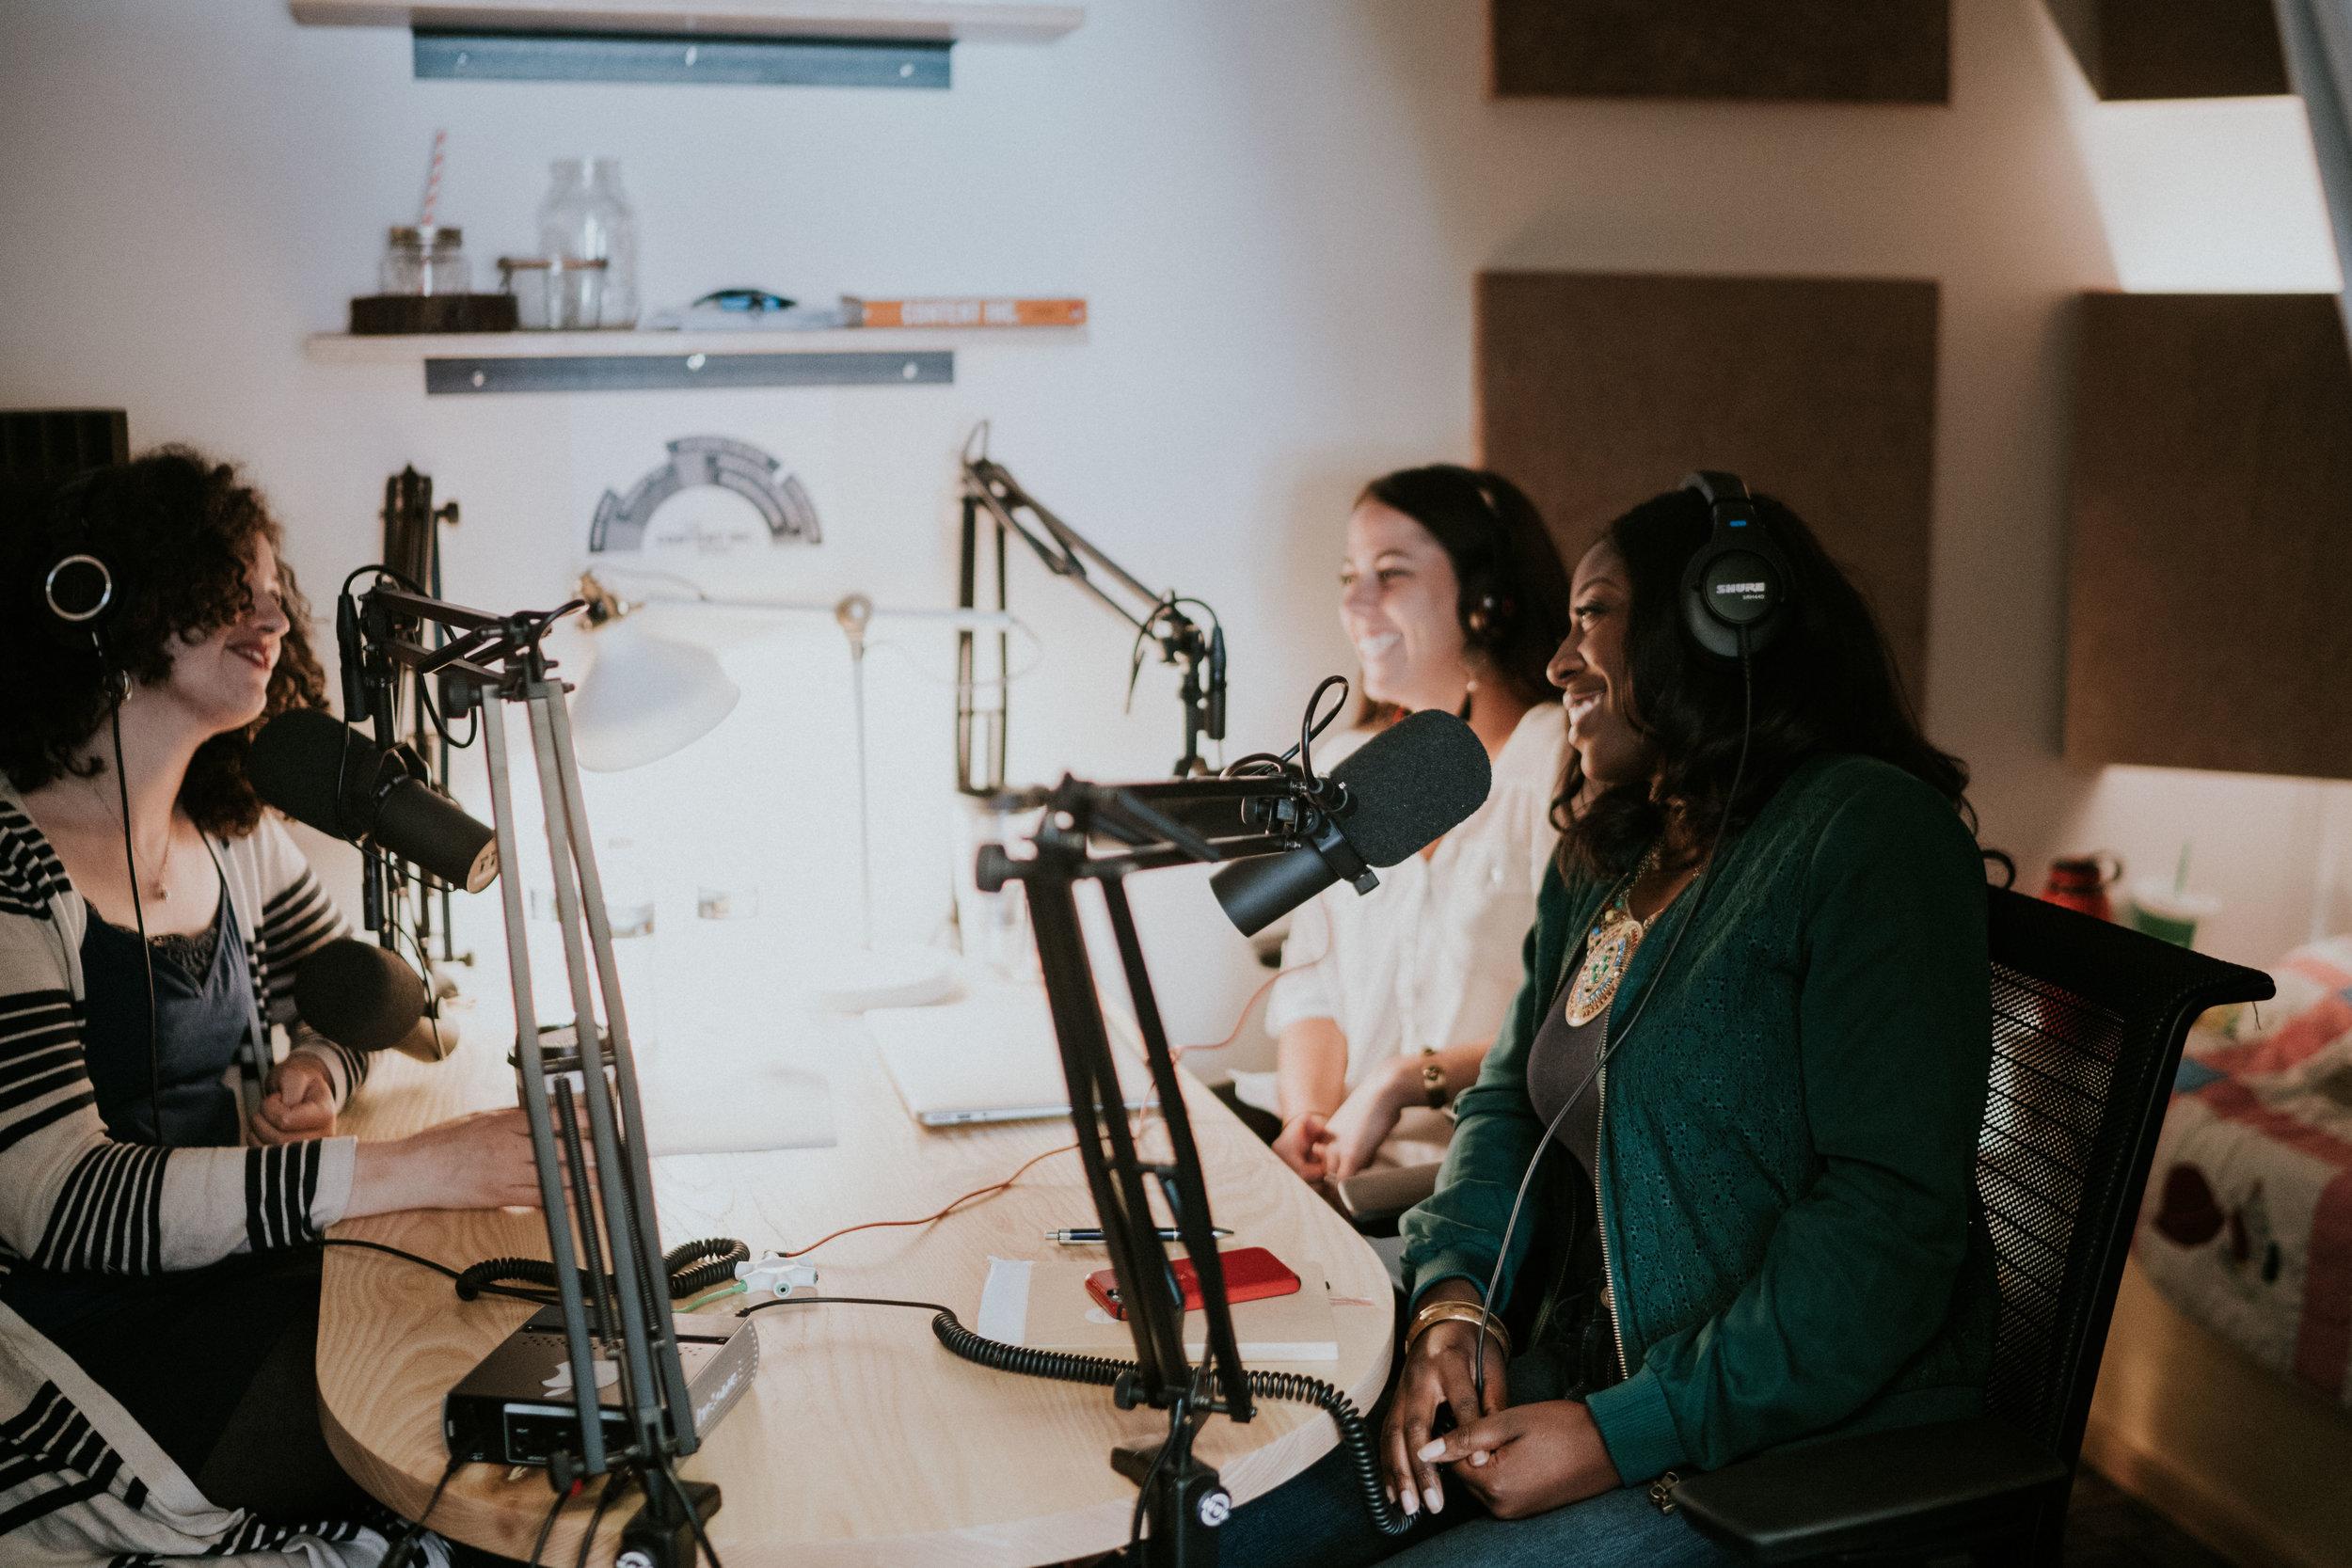 Inside the EC Podcast Studio